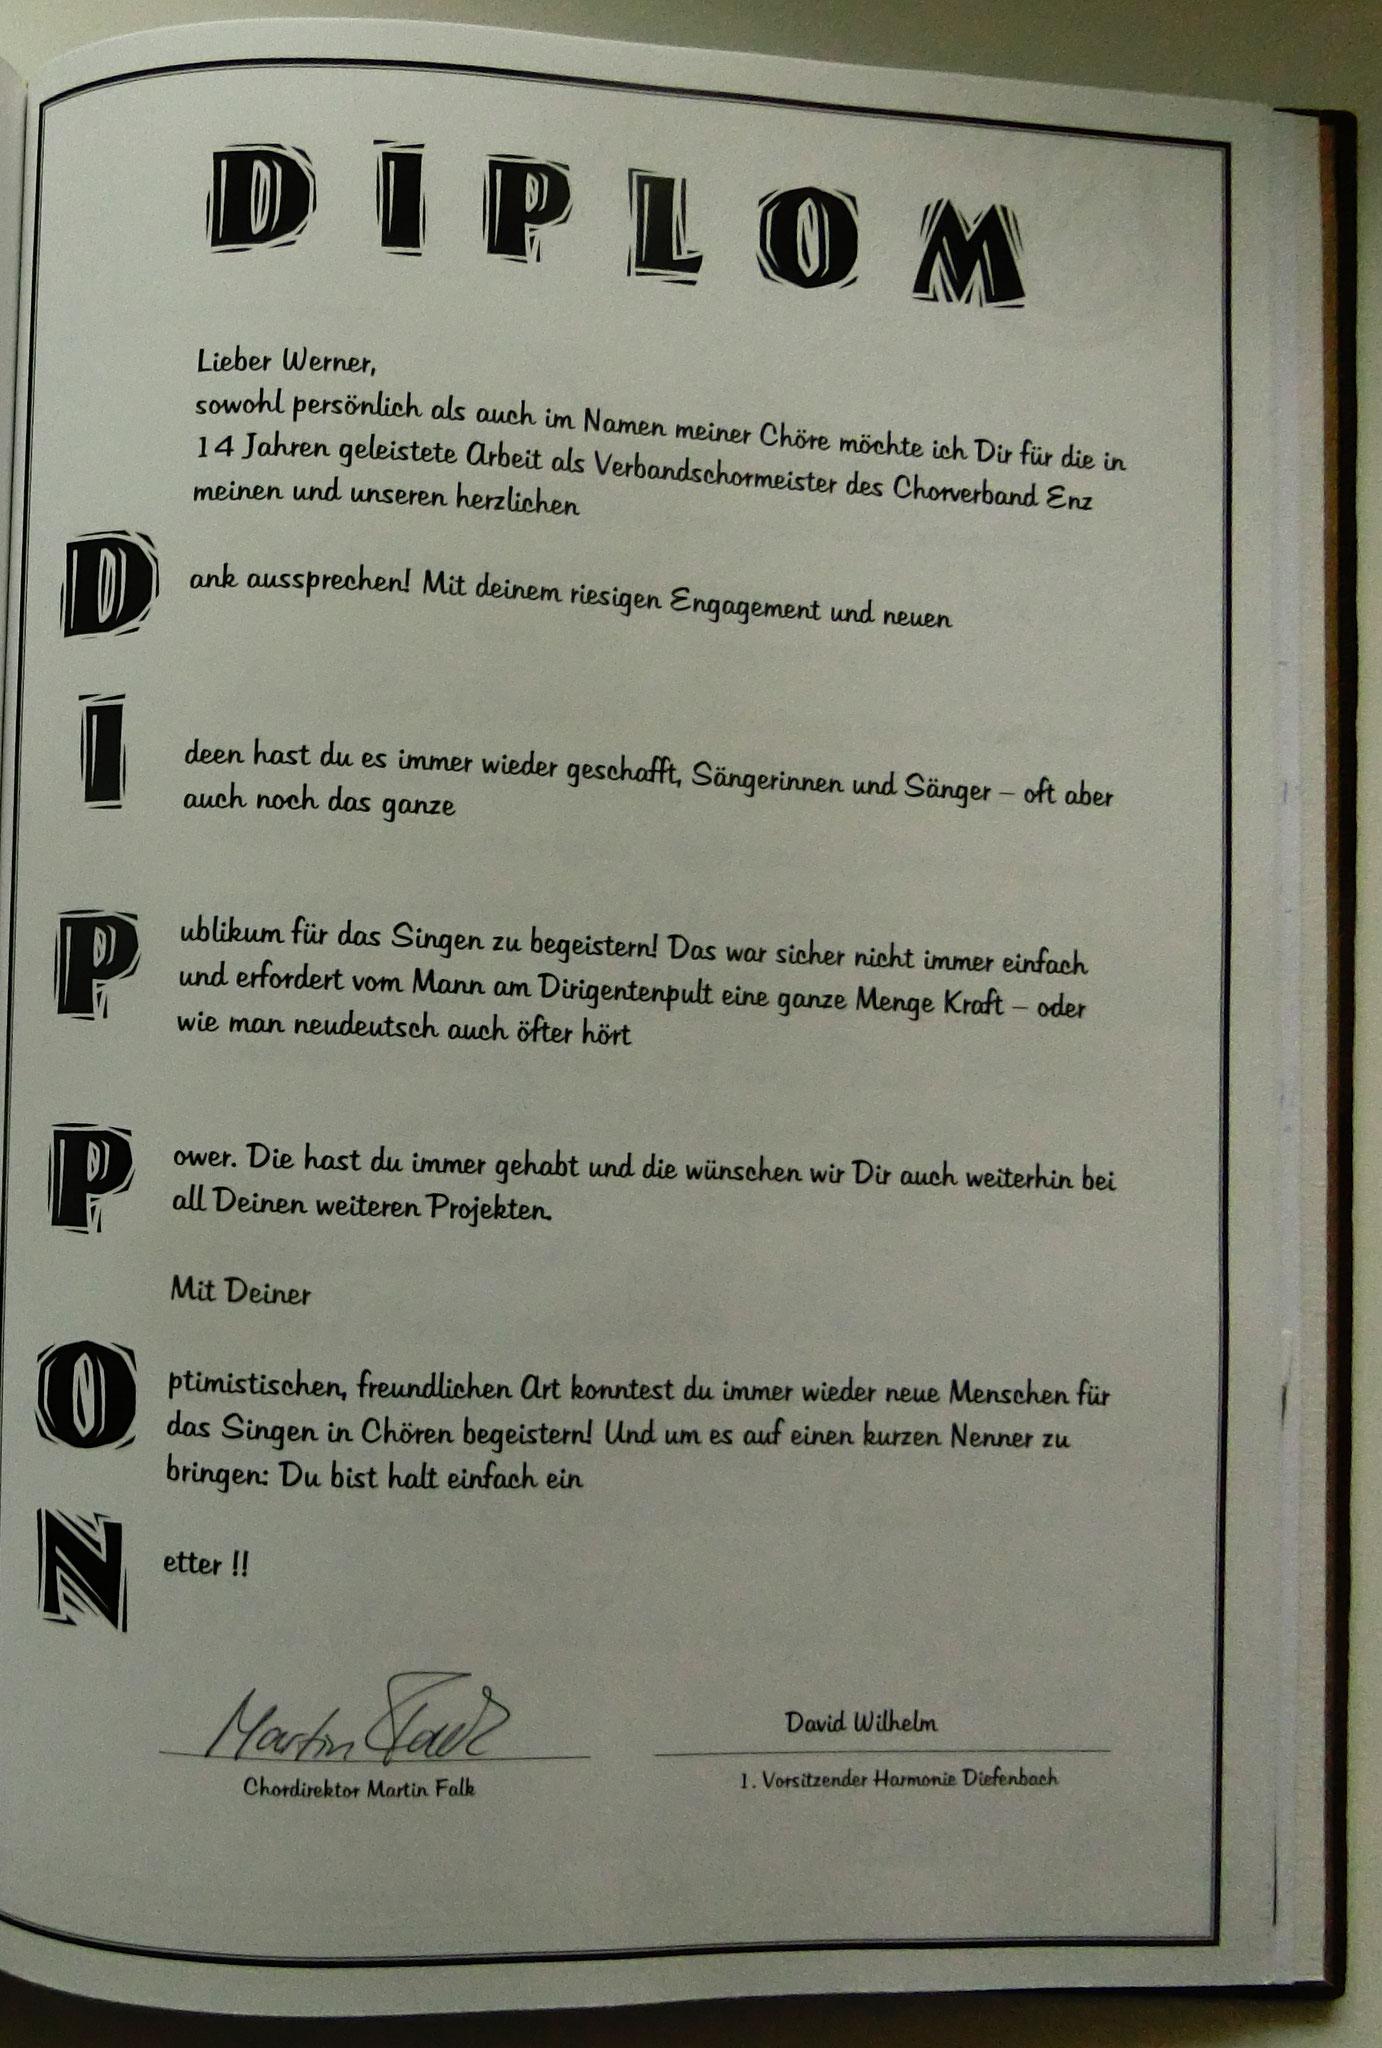 Harmonie Diefenbach